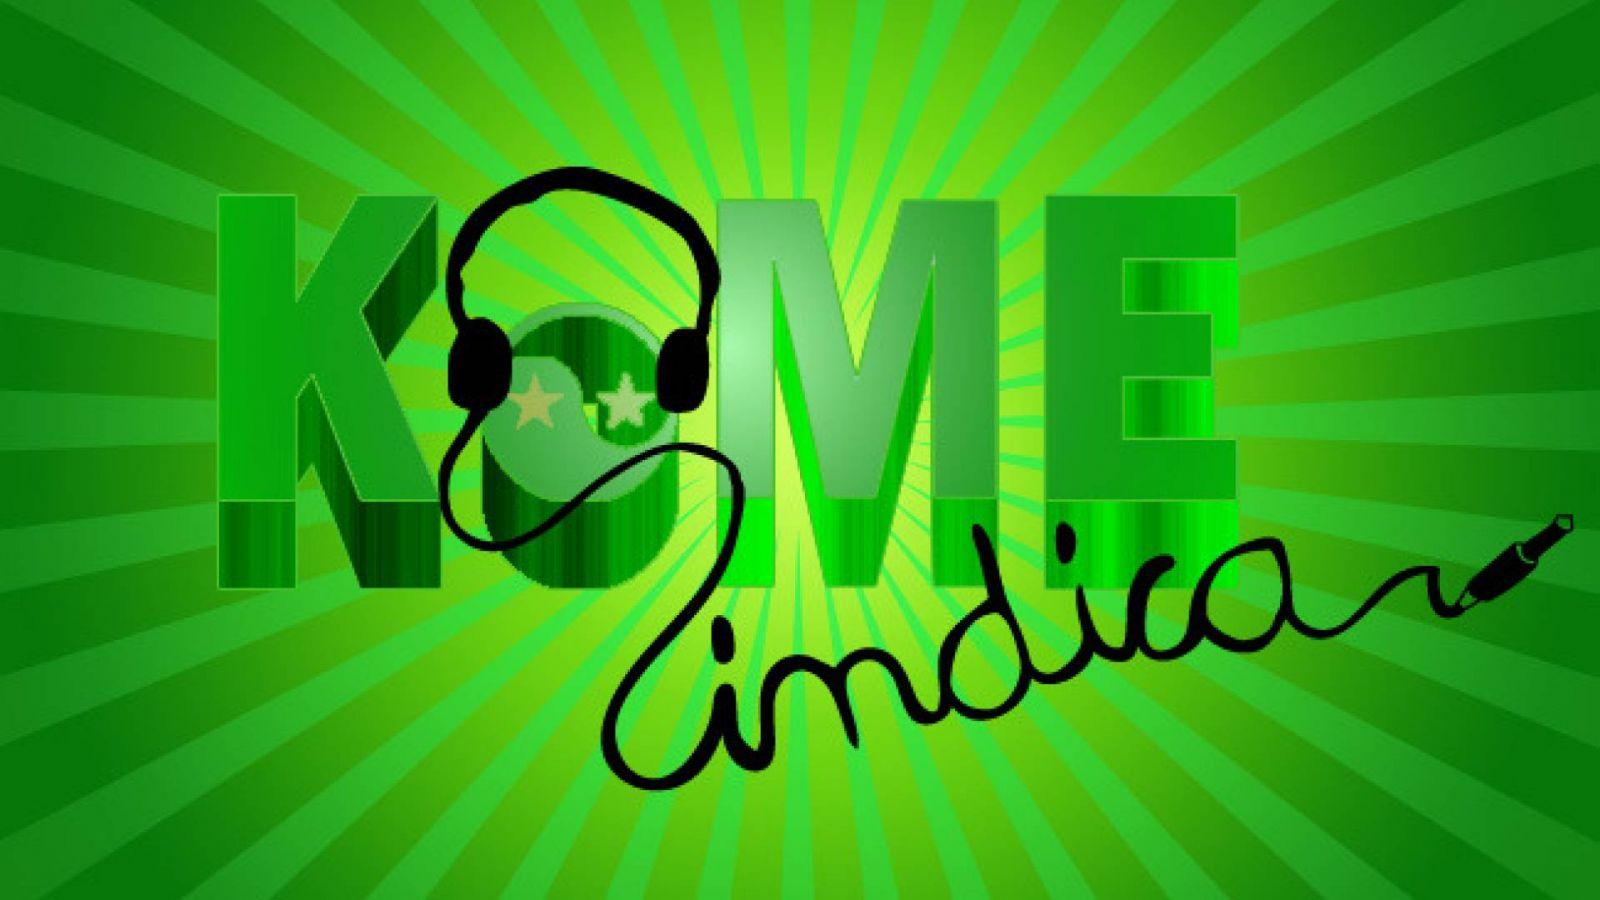 KoME Indica - 3 jib © KoME